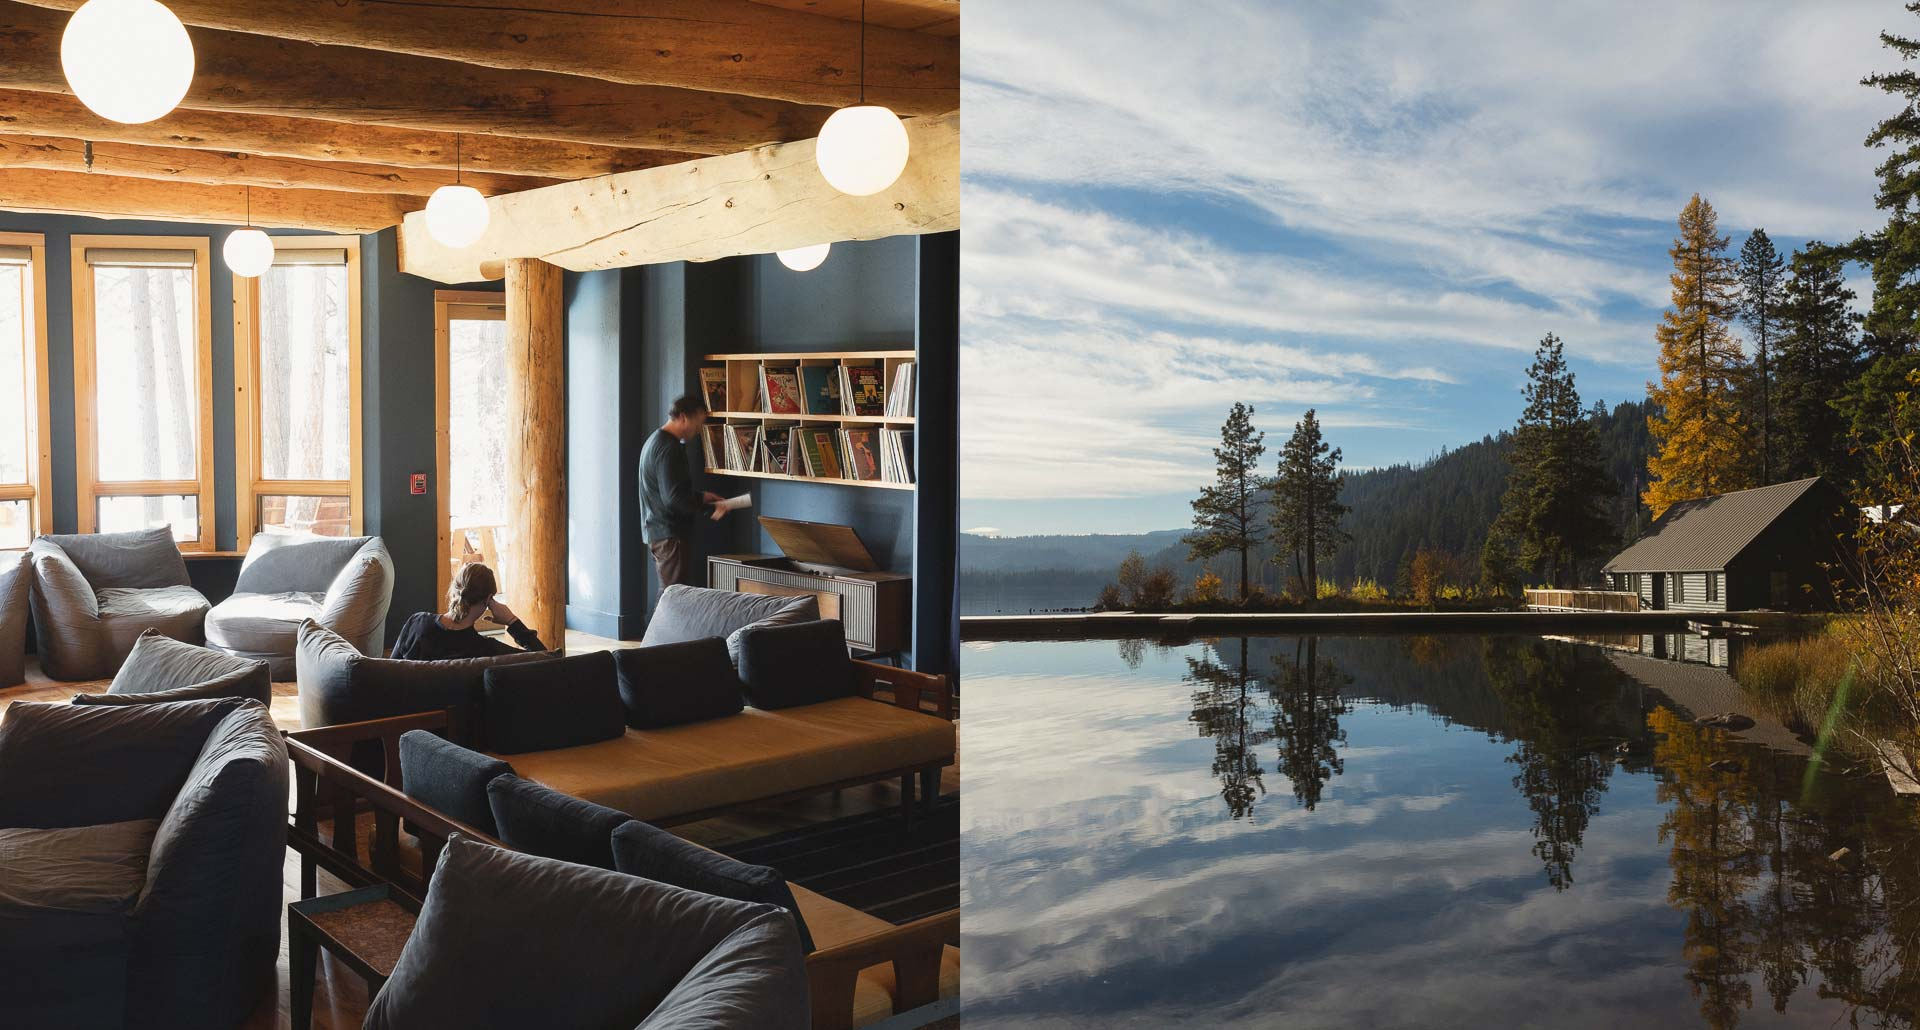 The Suttle Lodge & Boathouse Oregon